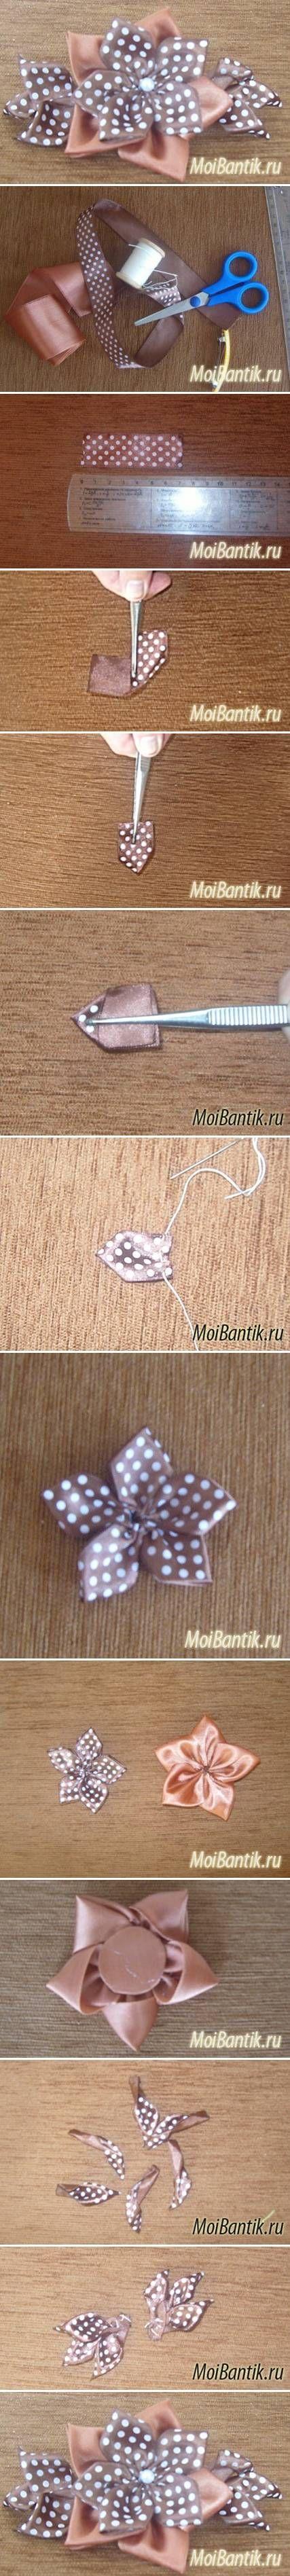 DIY Coffee Flower Hairpin DIY Projects | UsefulDIY.com Follow us on Facebook ==> https://www.facebook.com/UsefulDiy